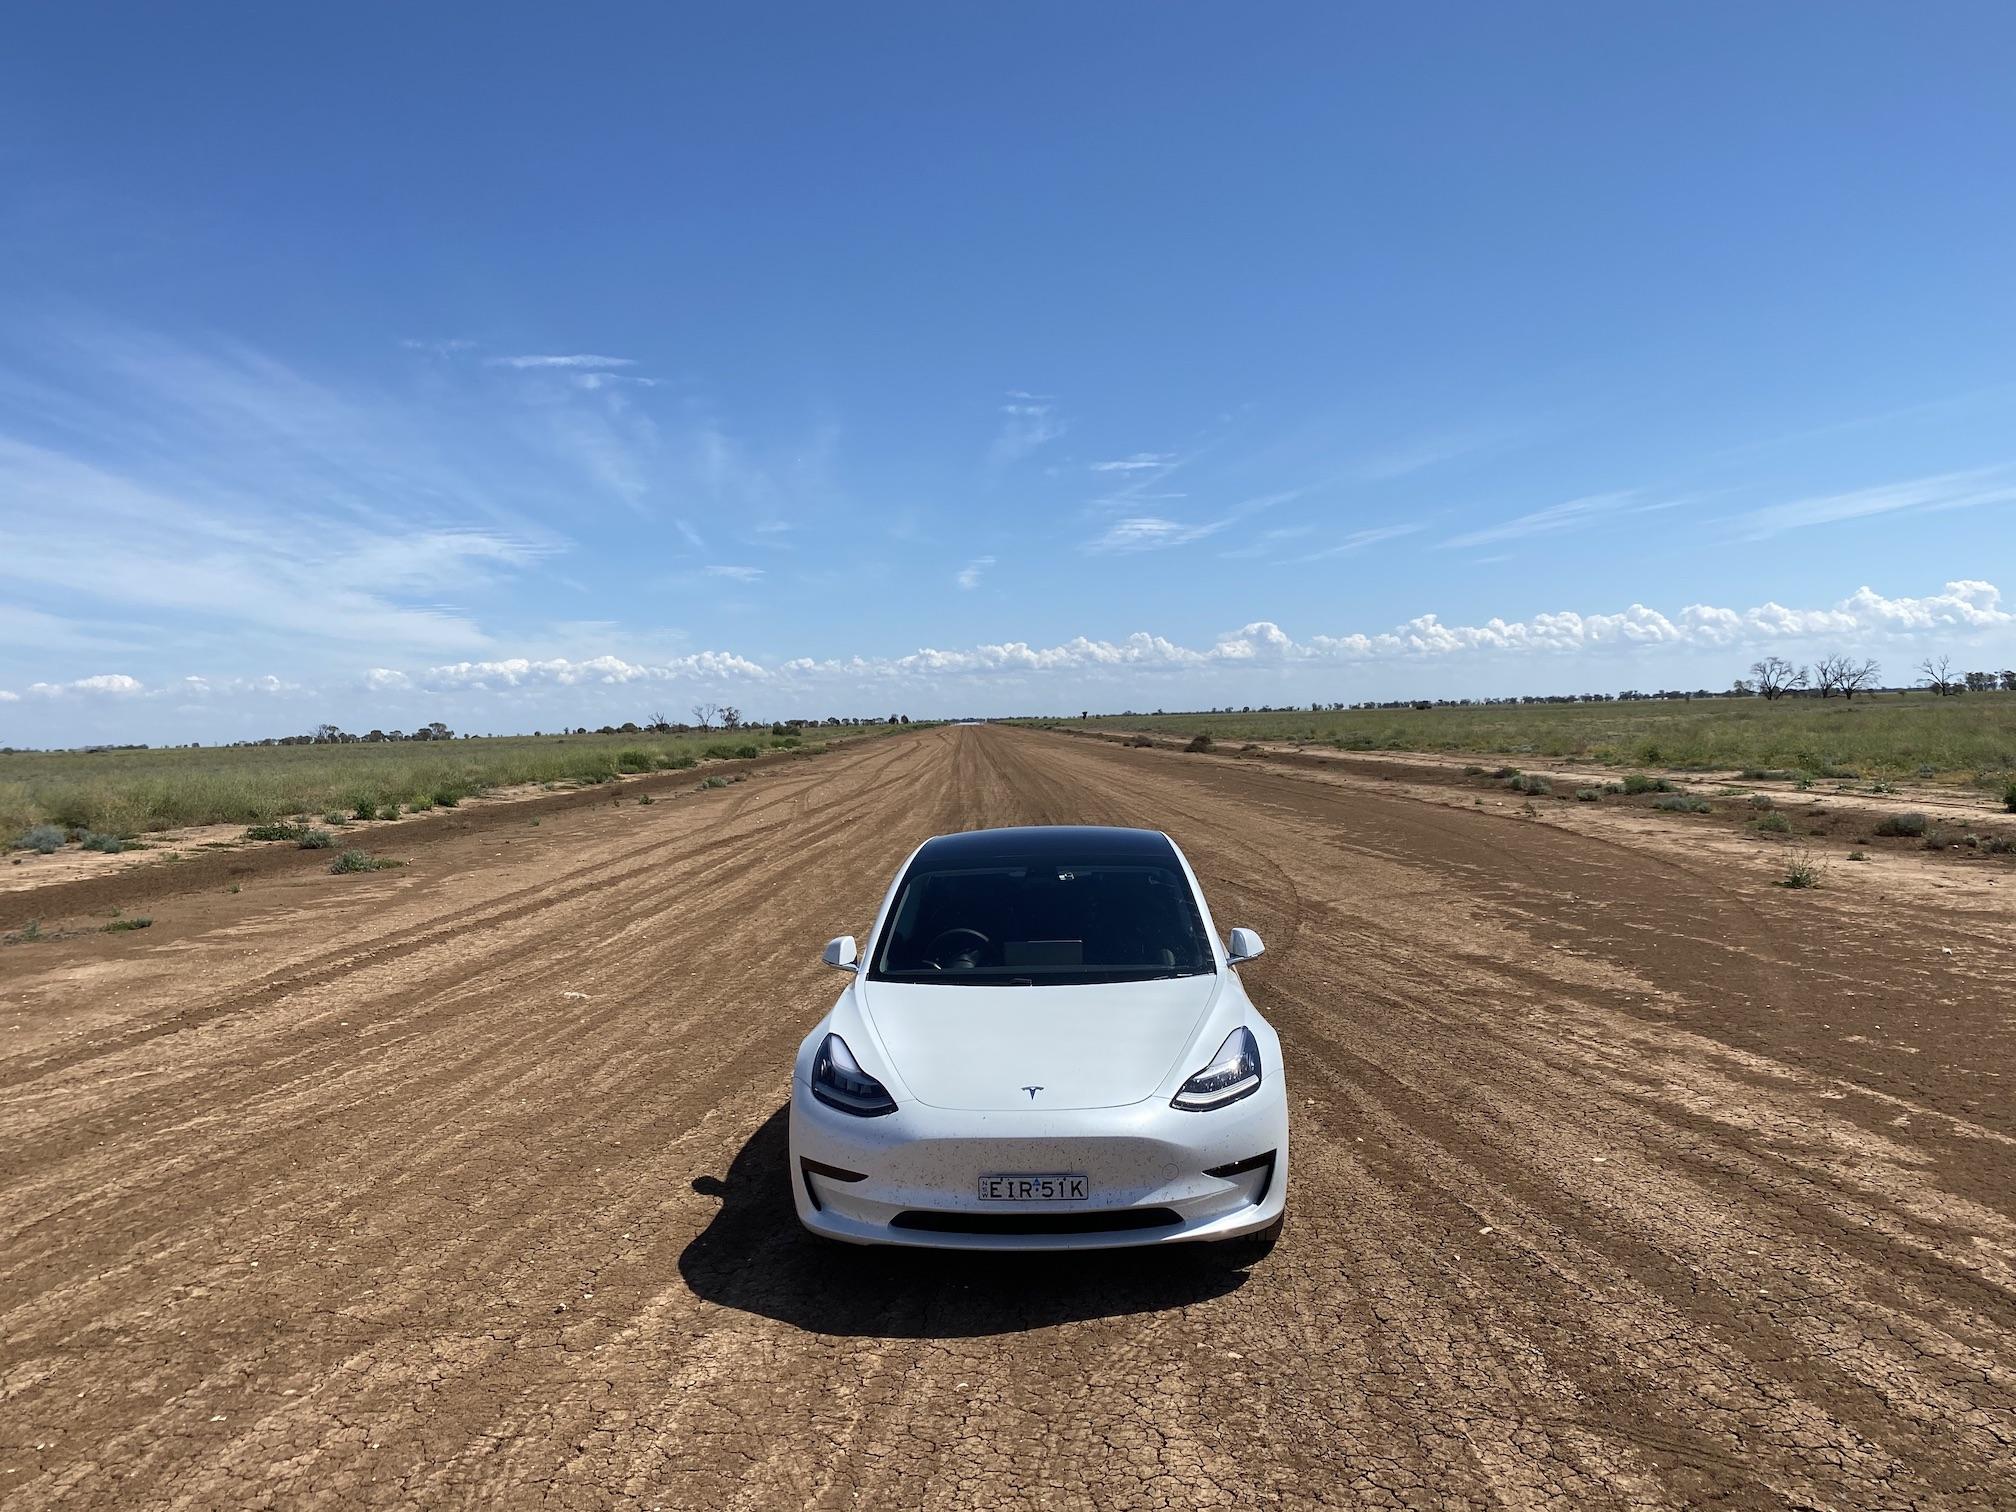 tesla on dirt road